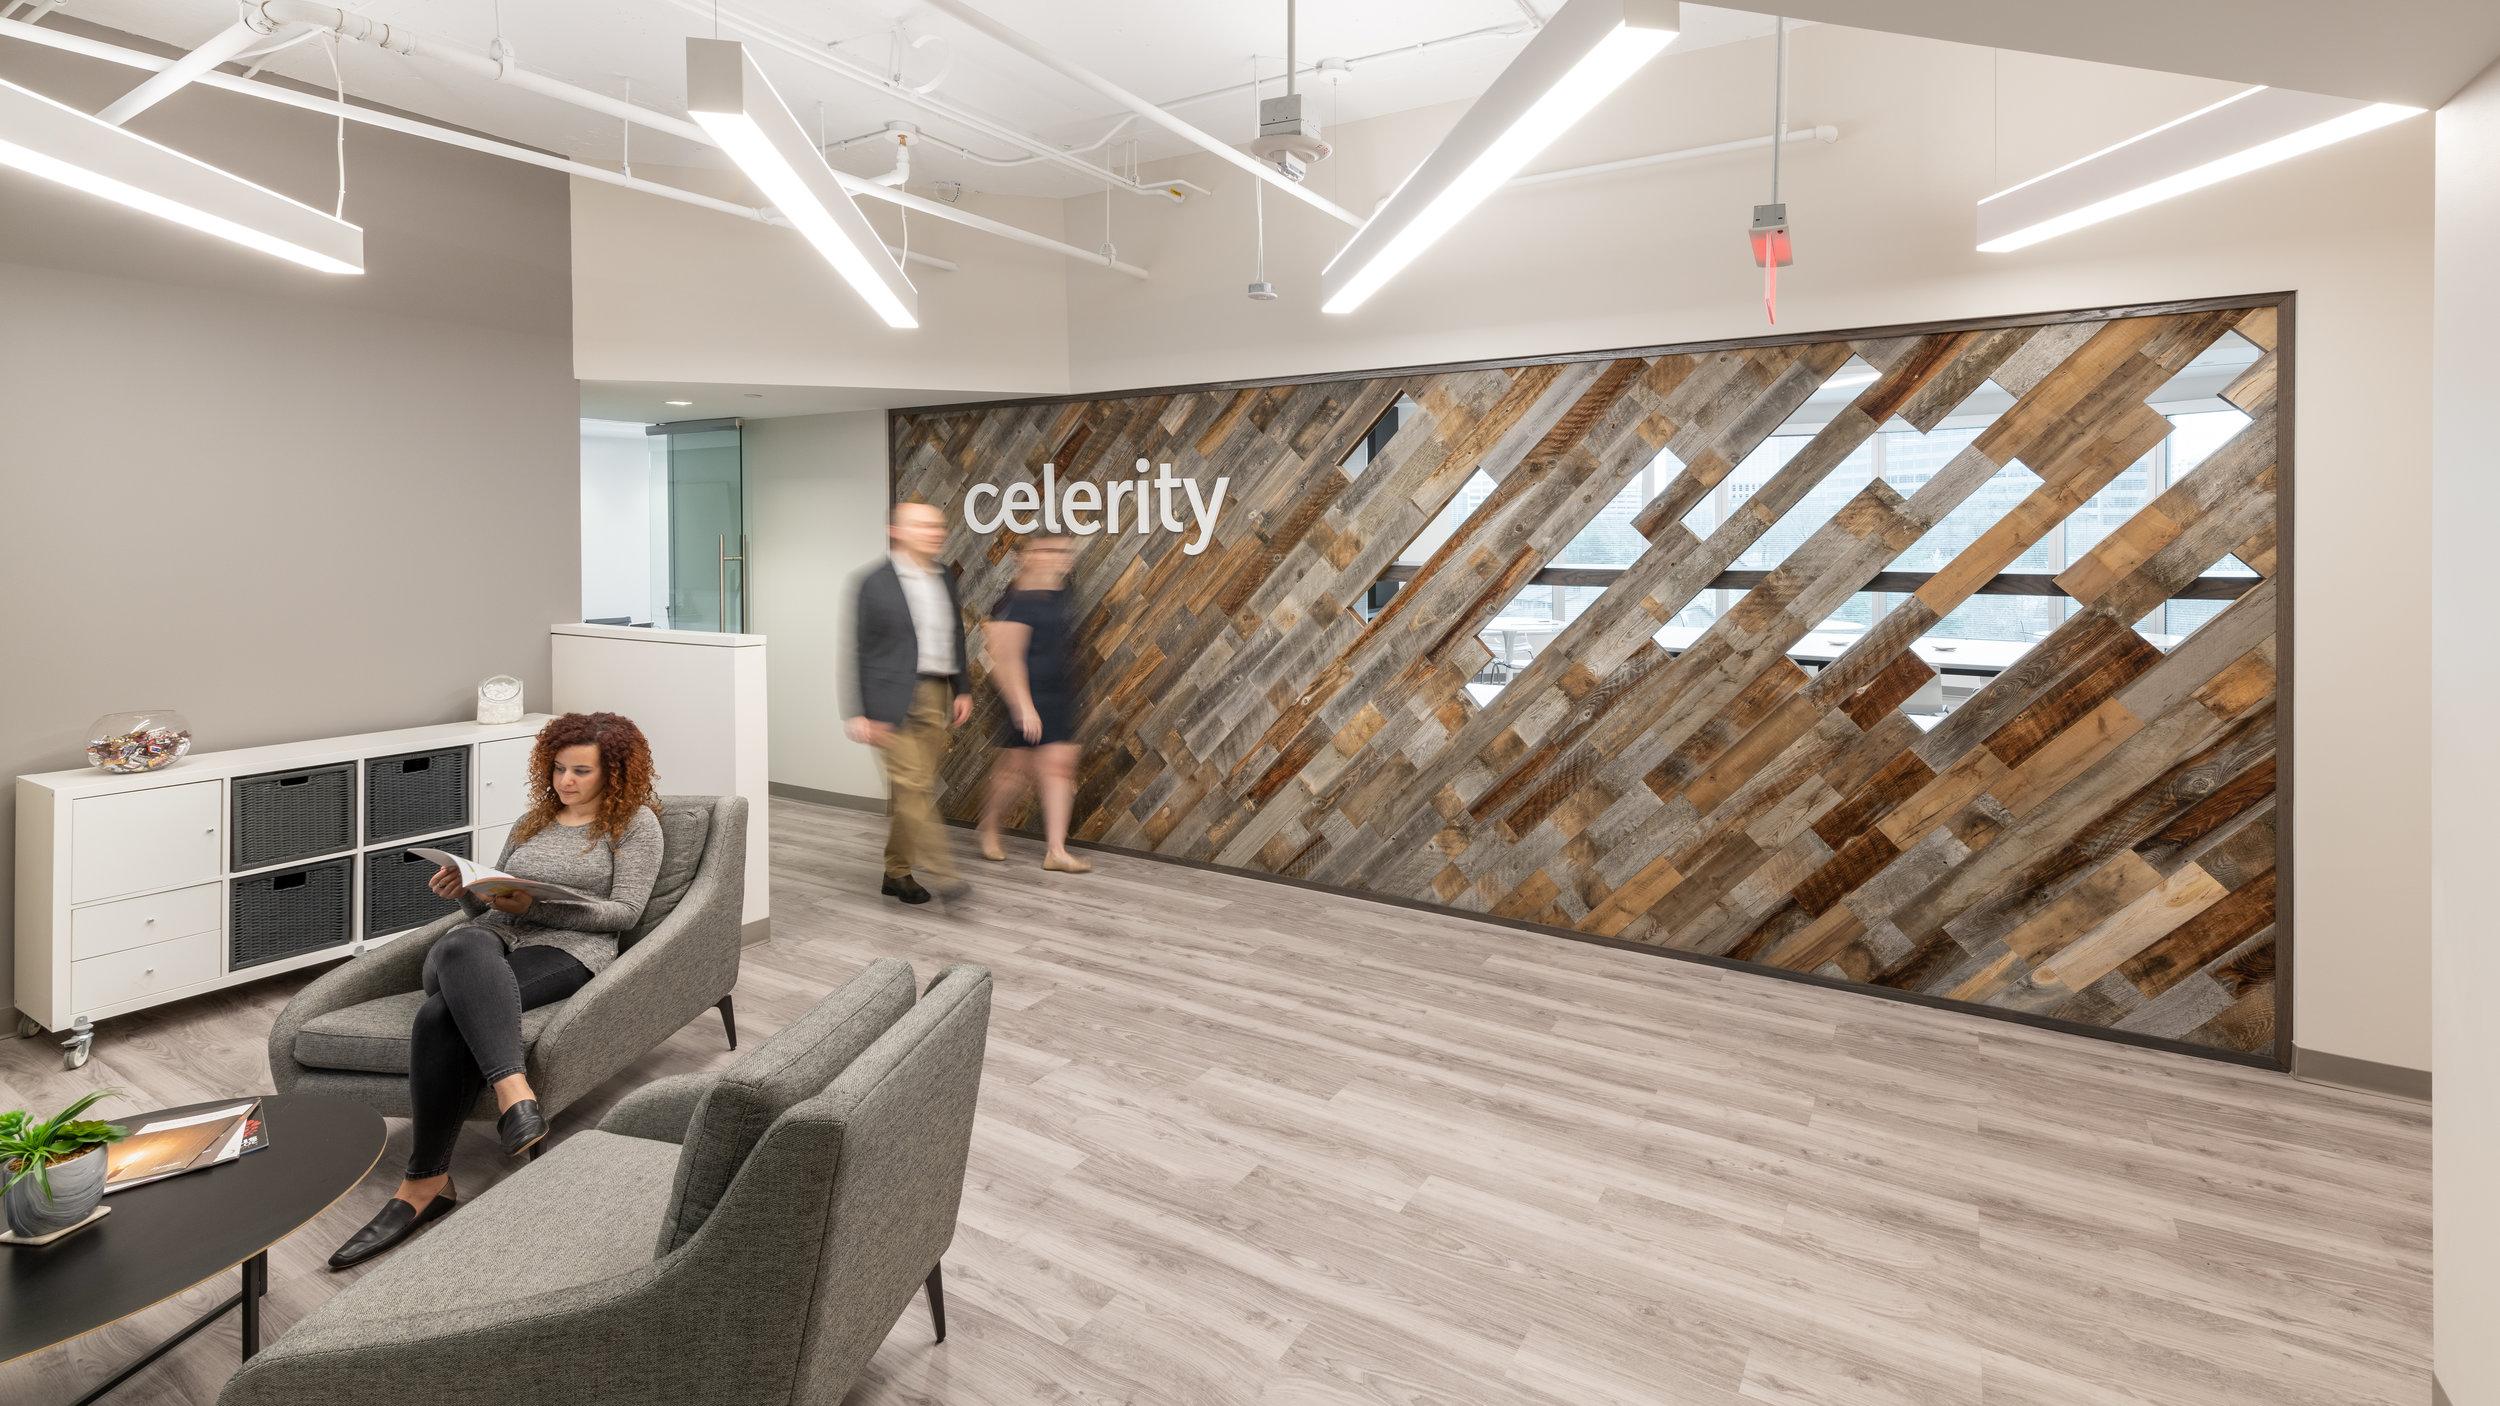 FOTO 180702 Celerity 2019-04-07 122.jpg